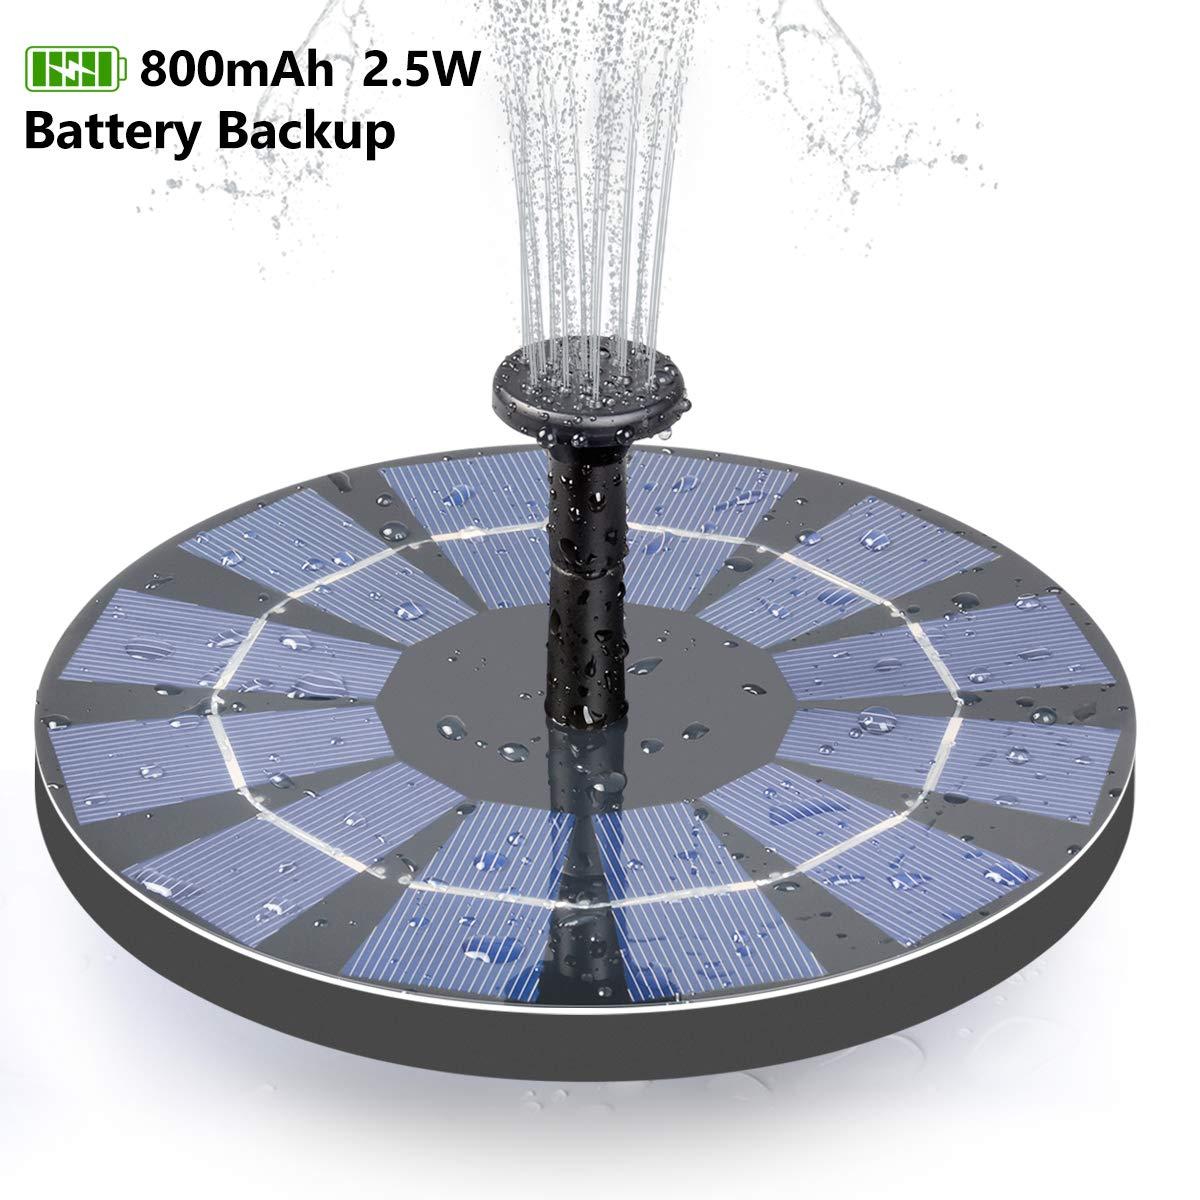 ADDTOP Solar Bird Bath Fountain with Battery Backup, 2.5W Free Standing Water Pump for Birdbath, Garden, Pond, Pool, Outdoor by ADDTOP